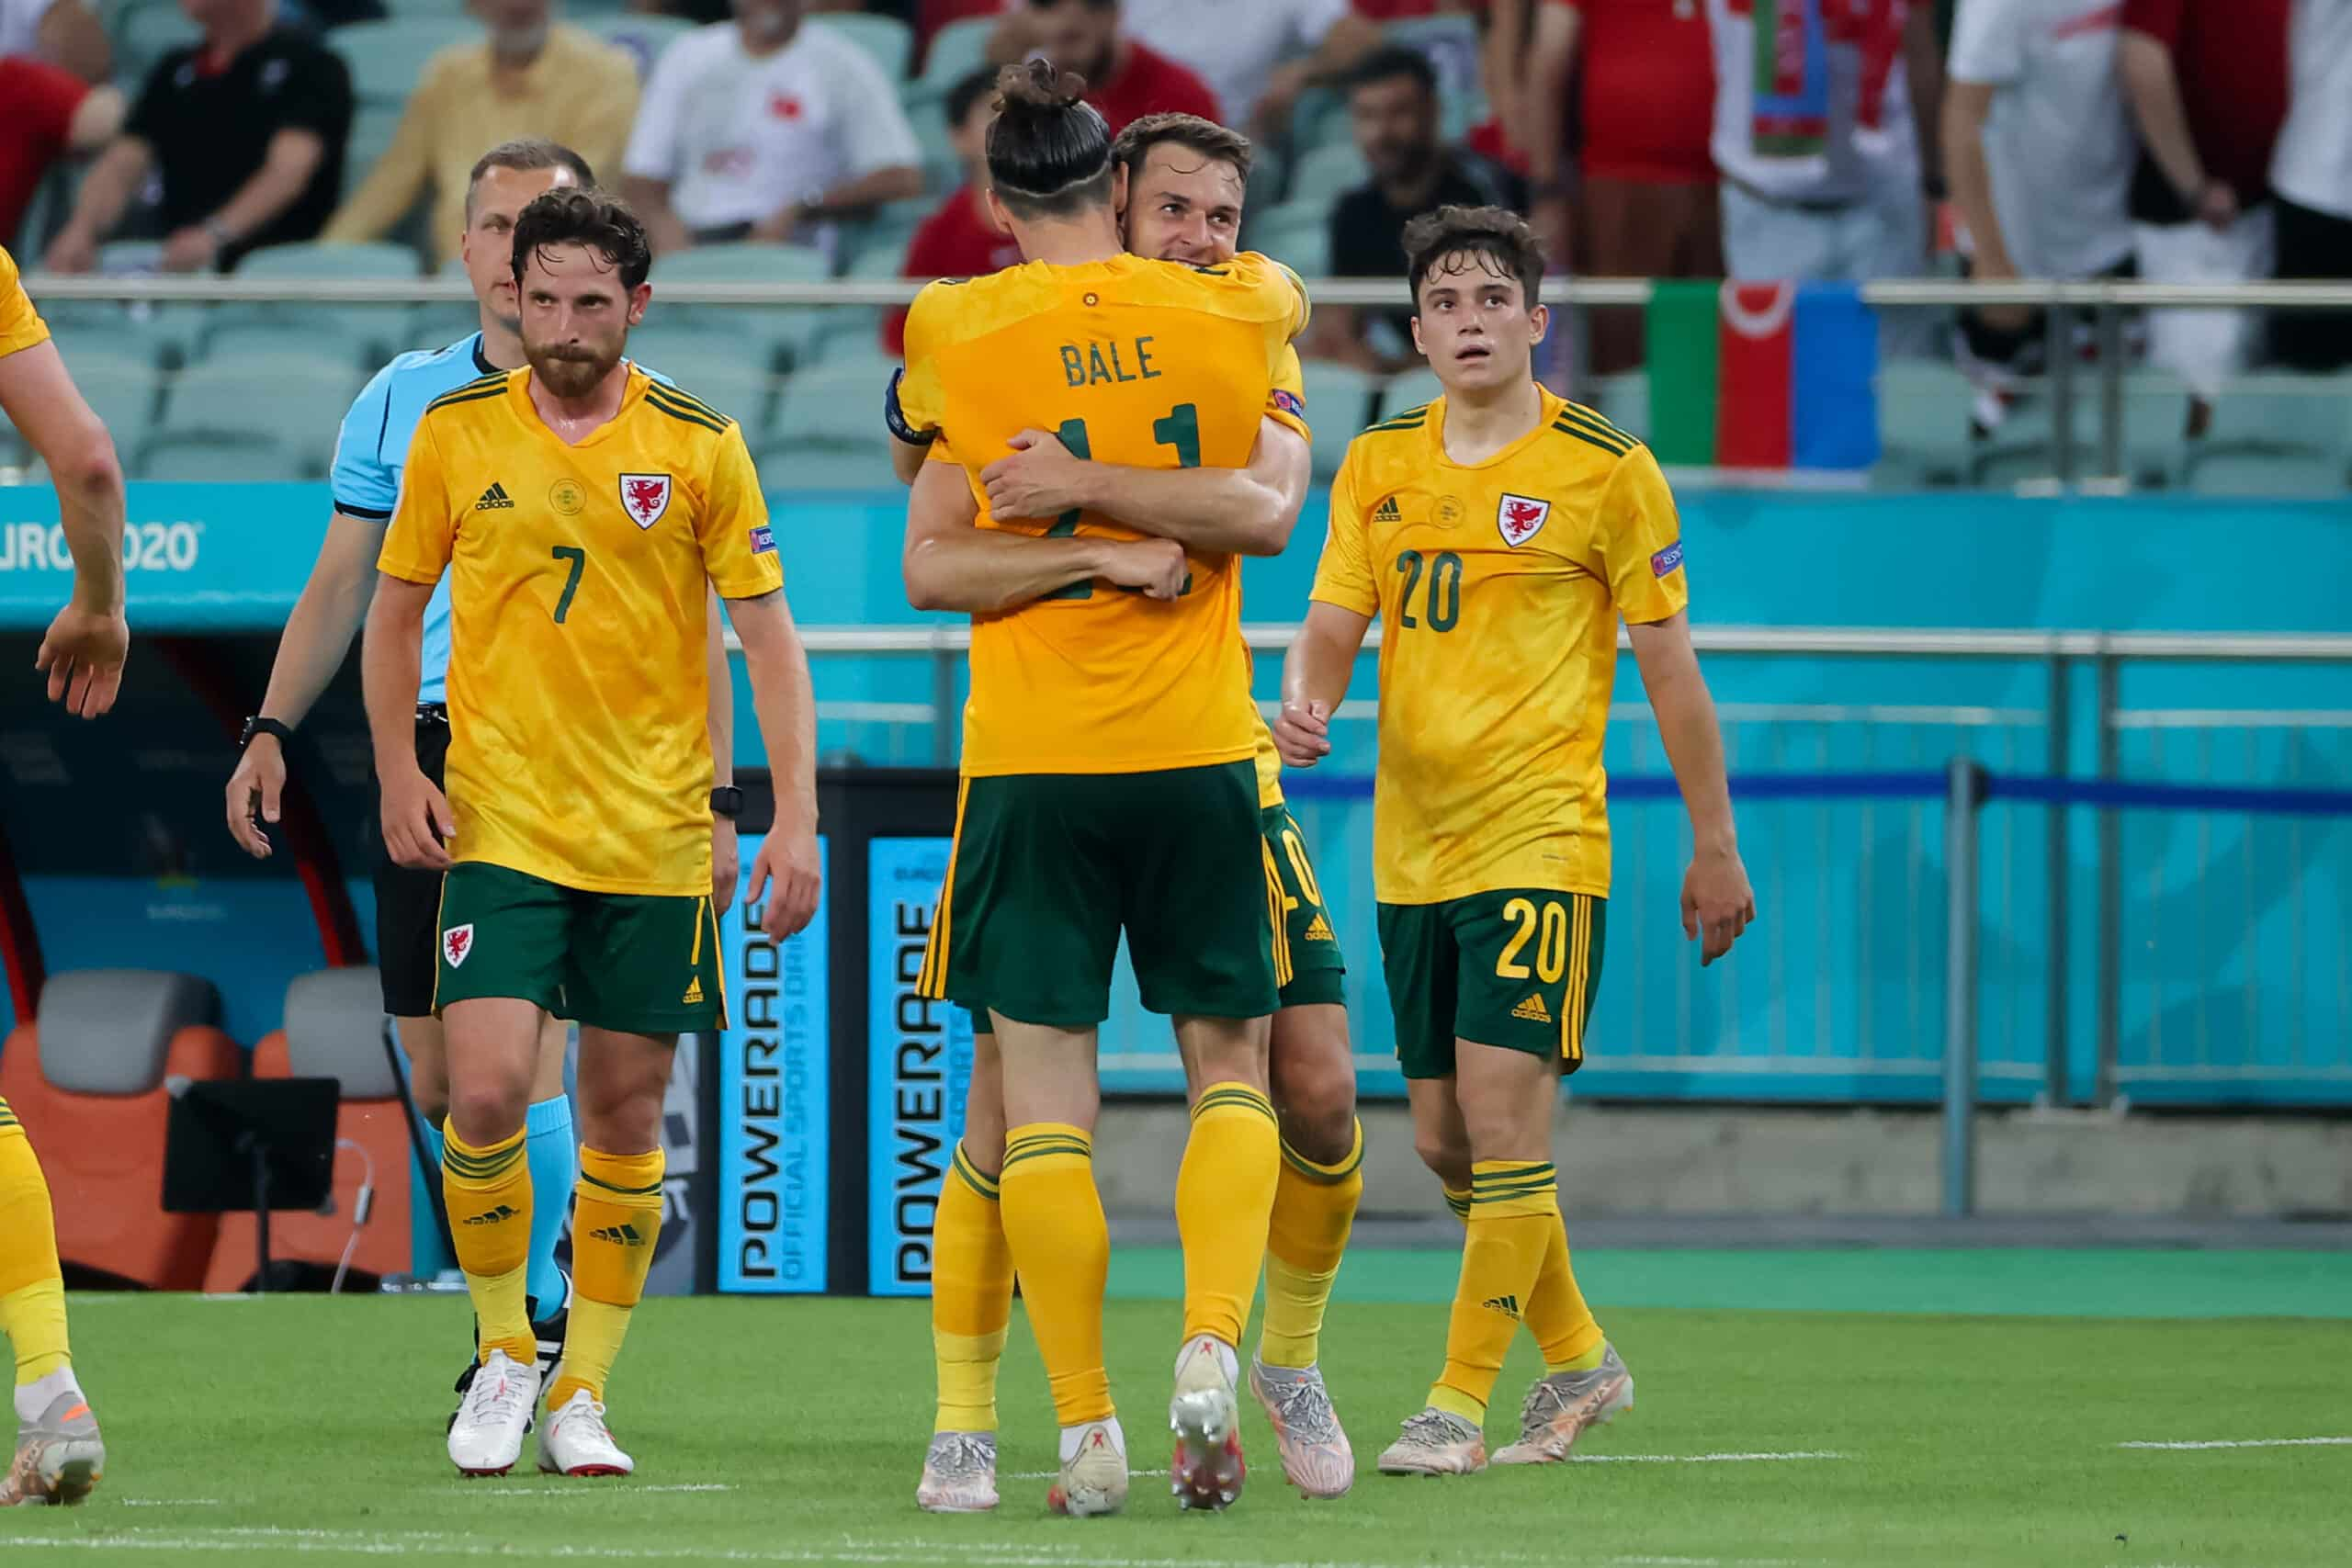 Bale (Wales) bejubelt Treffer mit Ramsey